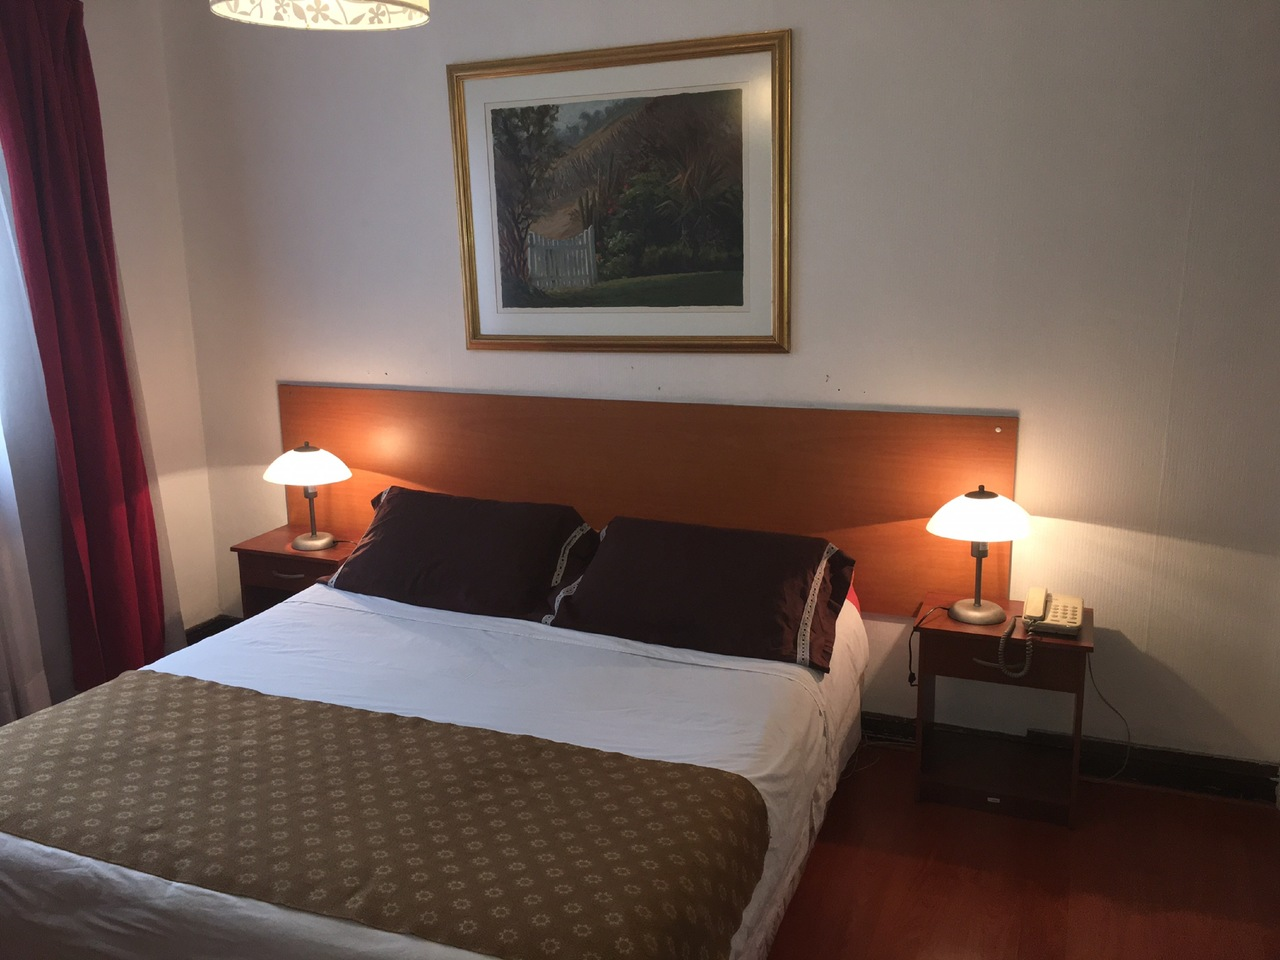 Hotel Quito en Santiago : MotelNow